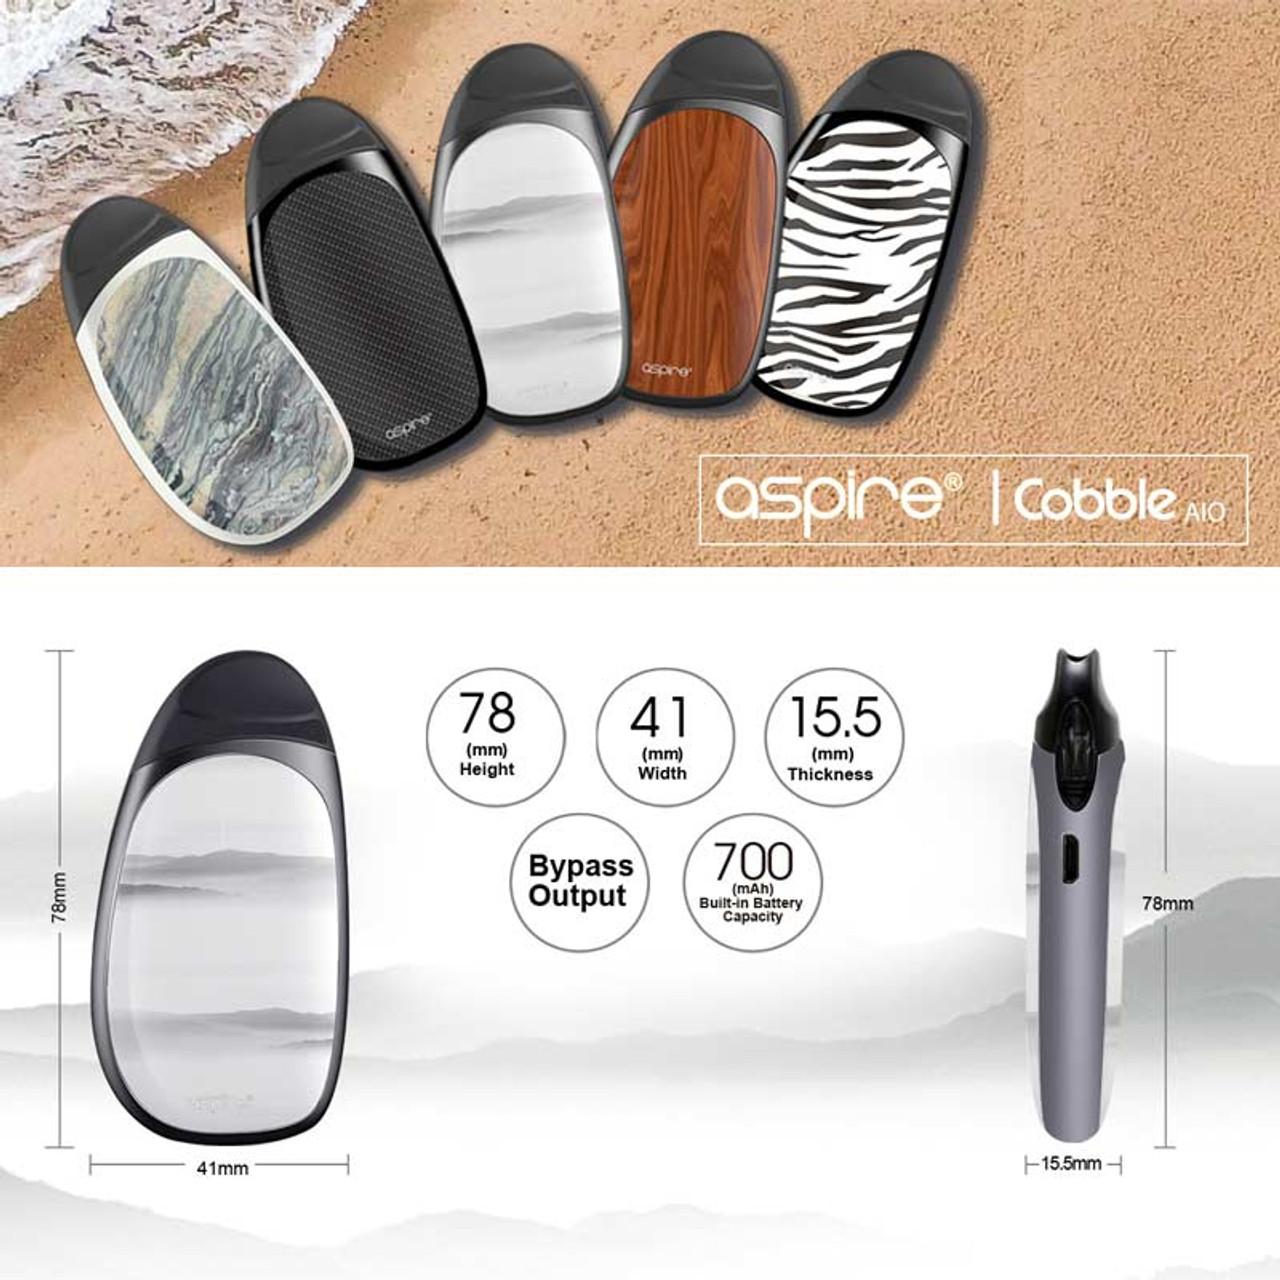 cobble pod  Aspire Cobble AIO 700mAh Starter Kit With 1.8ML Fillable Pod | Pod ...